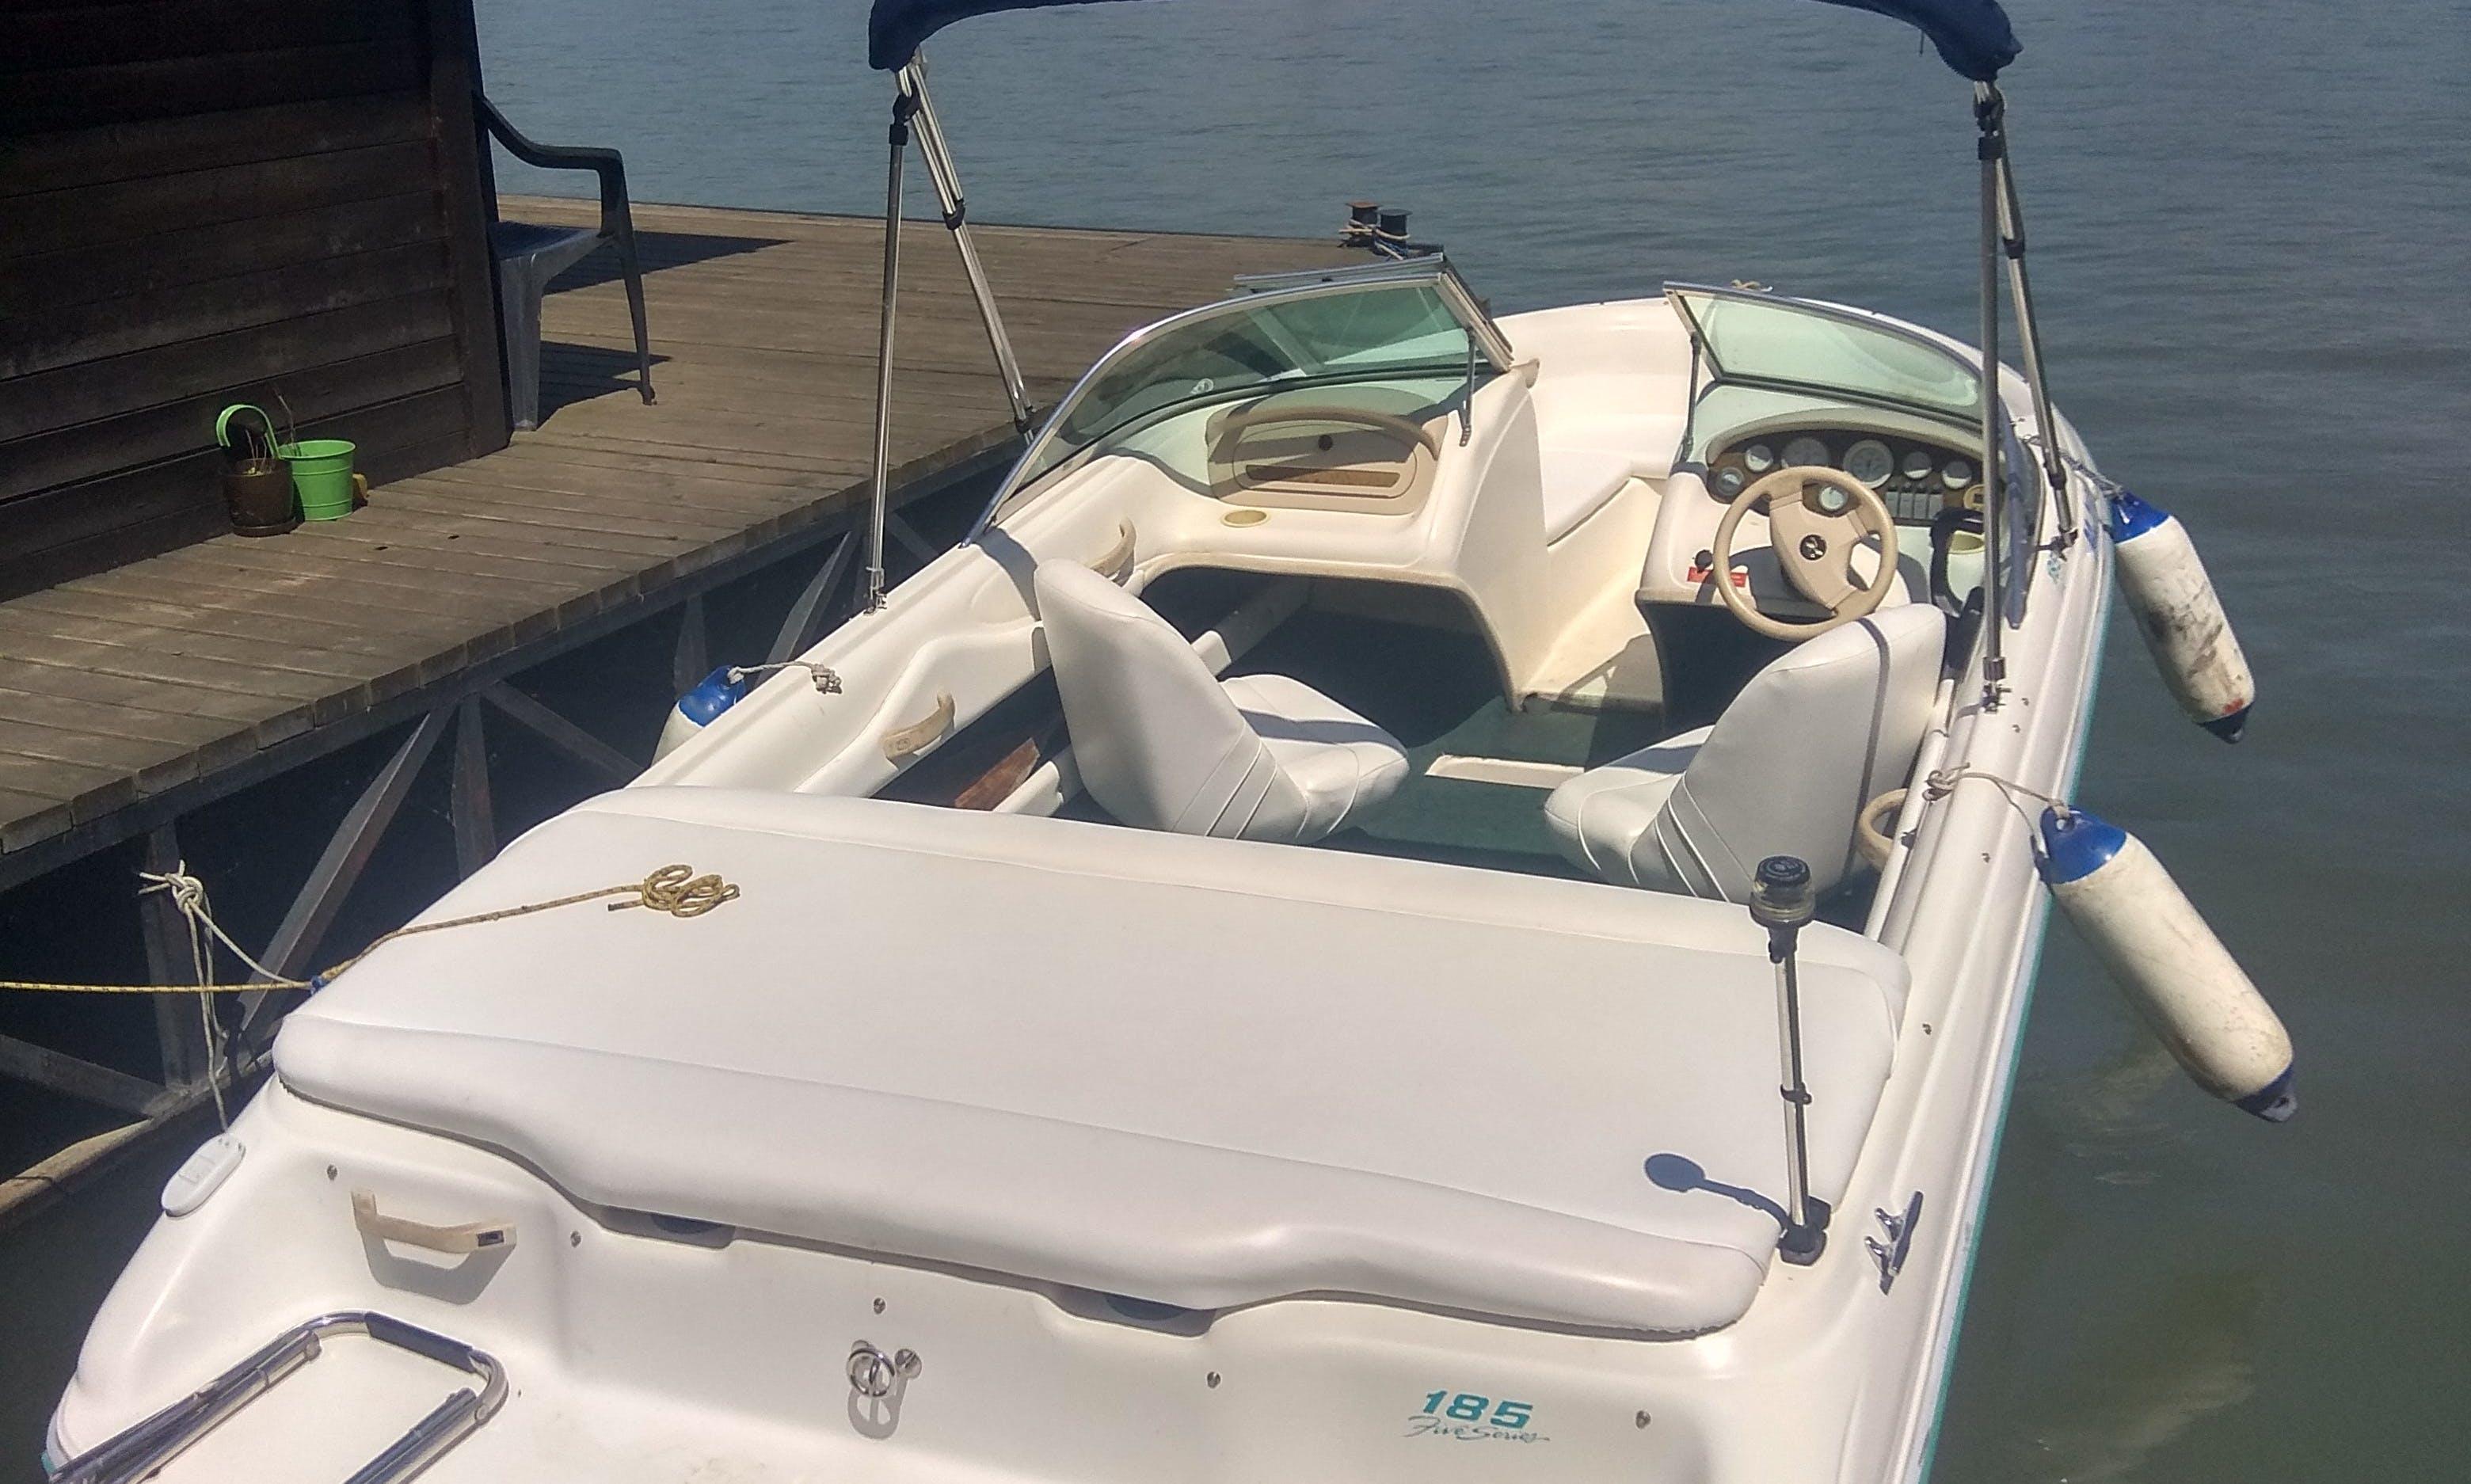 Sea Ray Bow Rider 185 rental in Belgrade